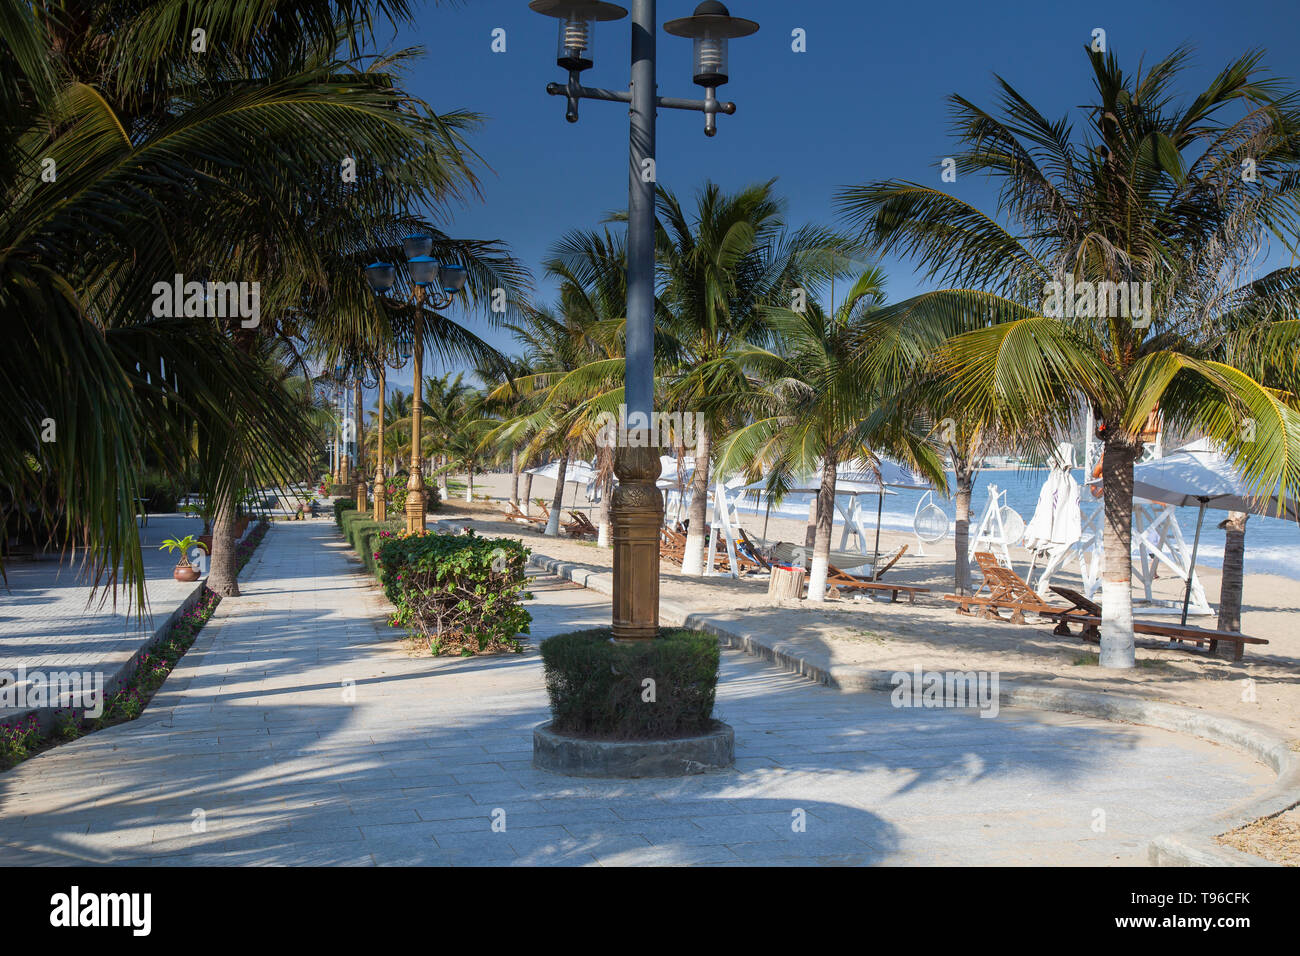 Beach promenade with palms at TTC Resort, South China Sea,Phan Rang, Ninh Thuan,Vietnam, Asia - Stock Image